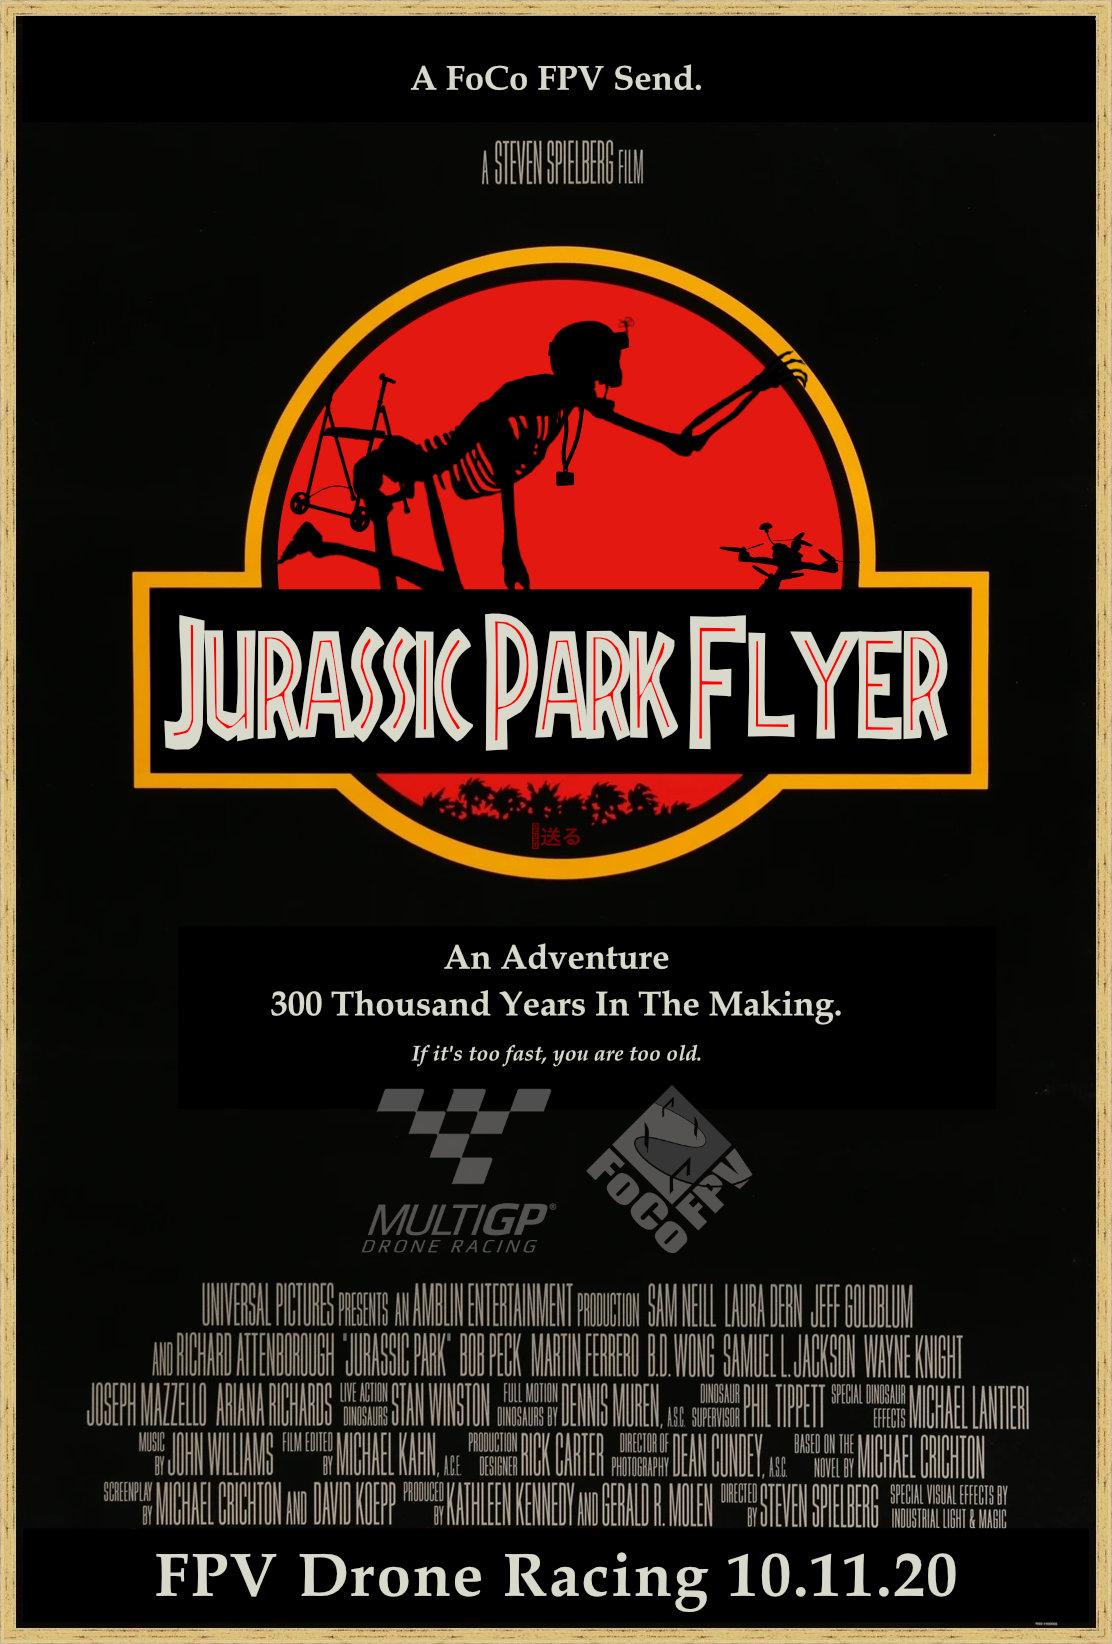 Jurassic Park Flyer